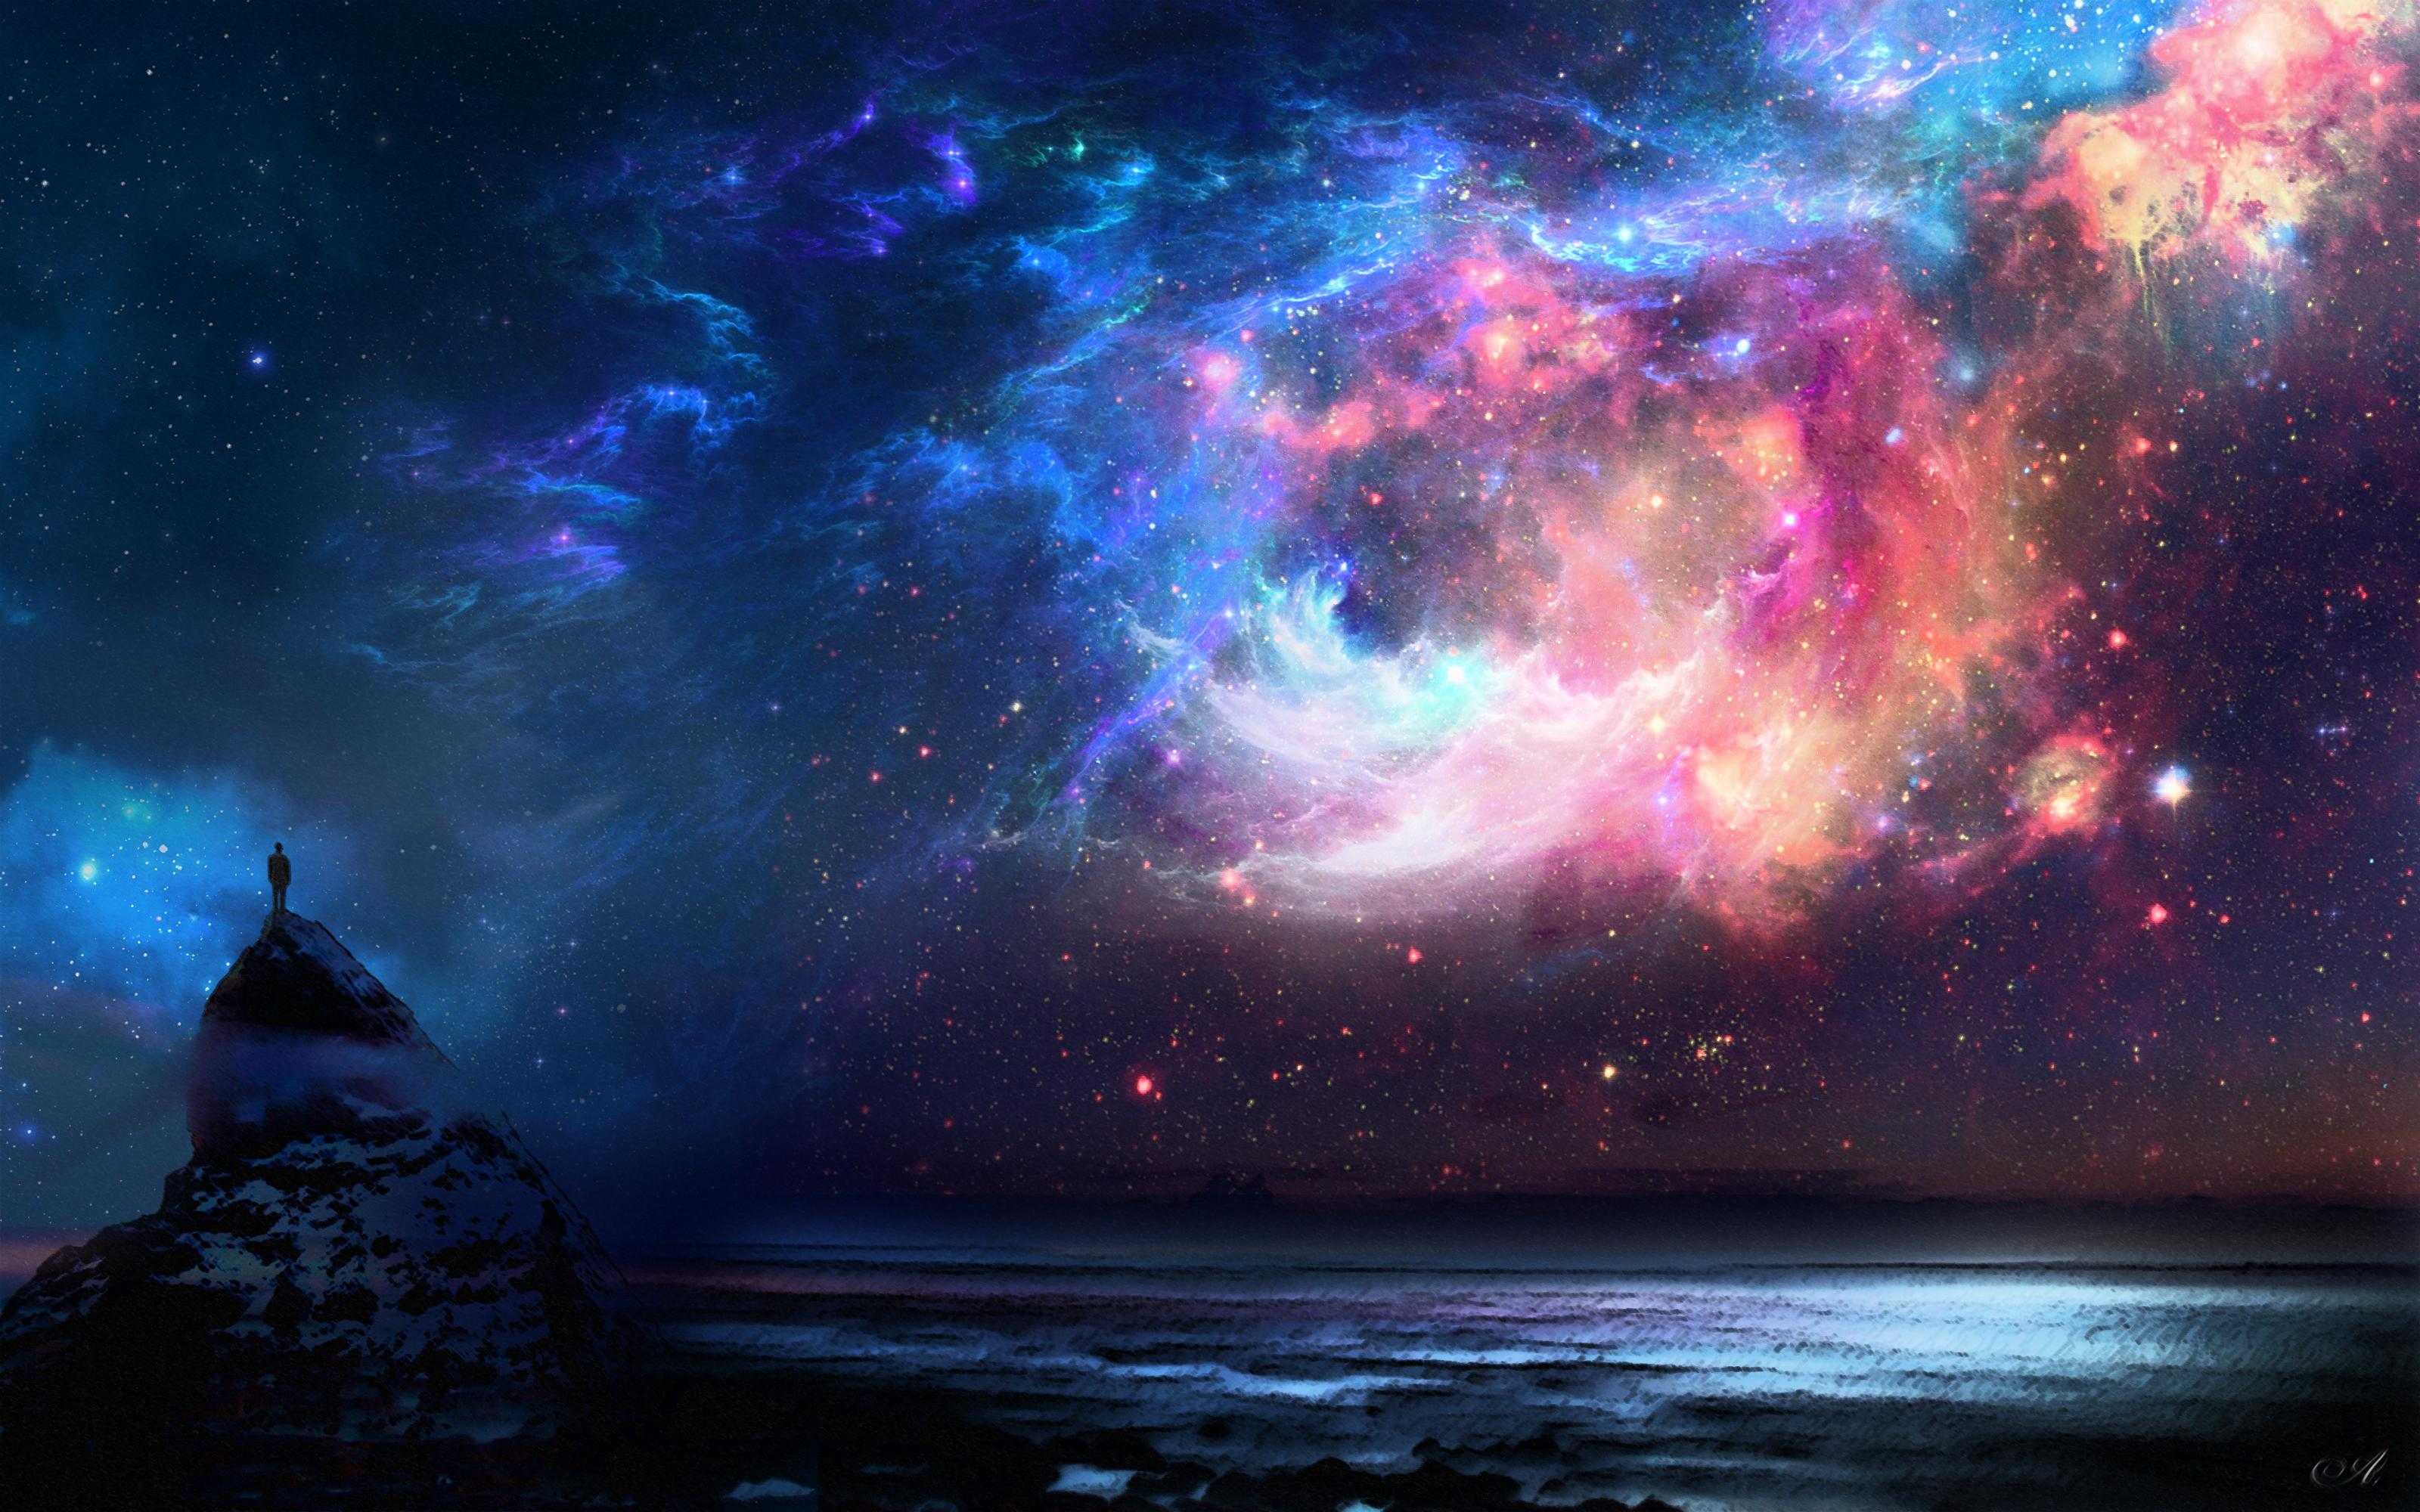 032149-beaches-fantasy-space